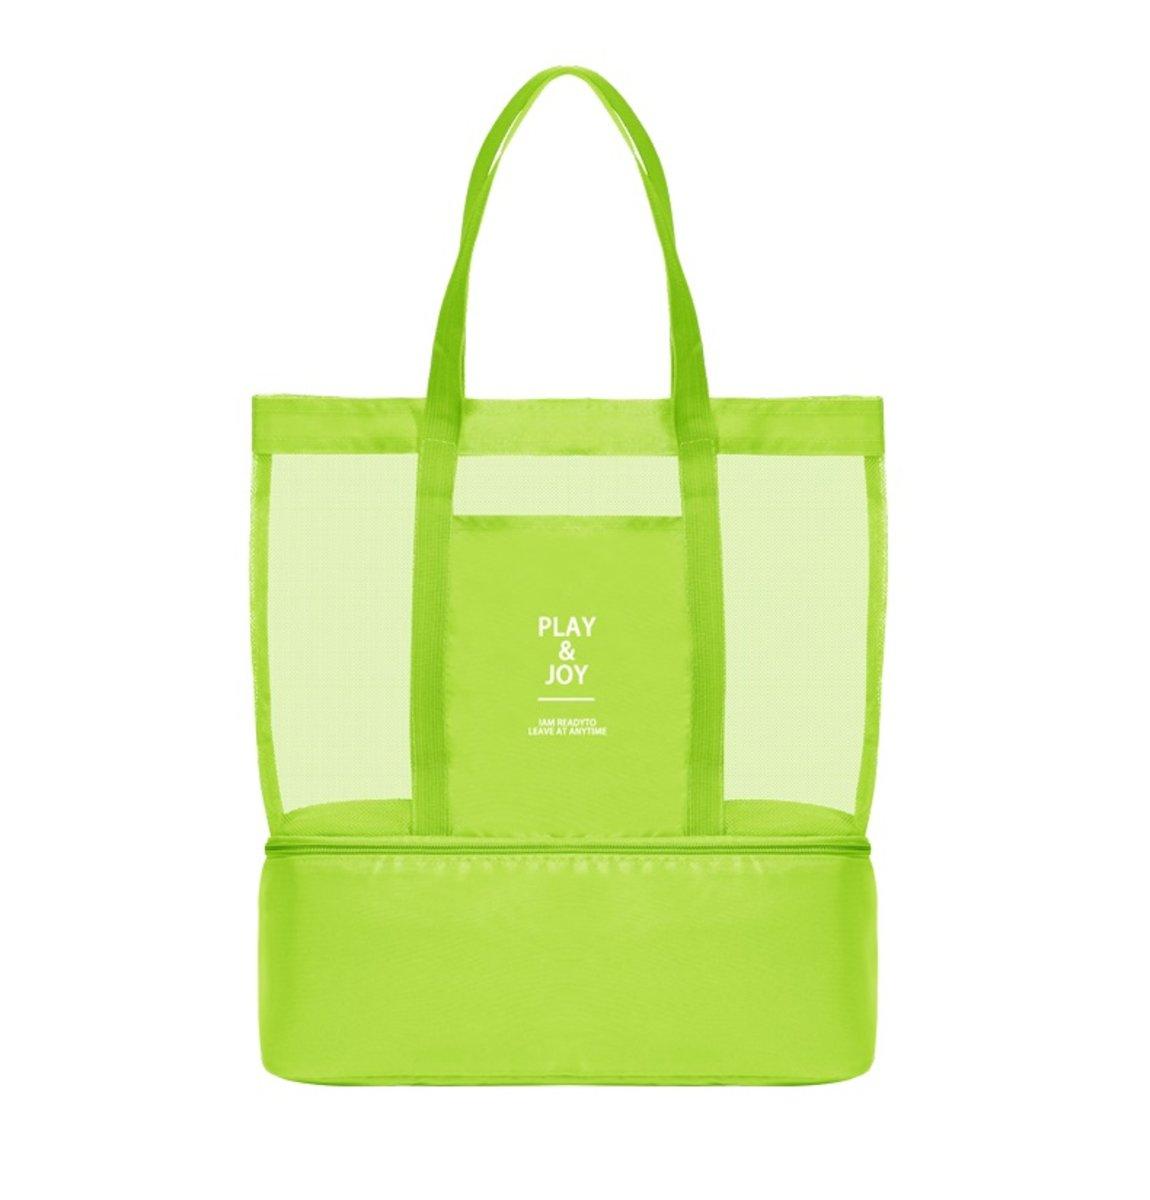 Travel Sports Layered Bag (Green)